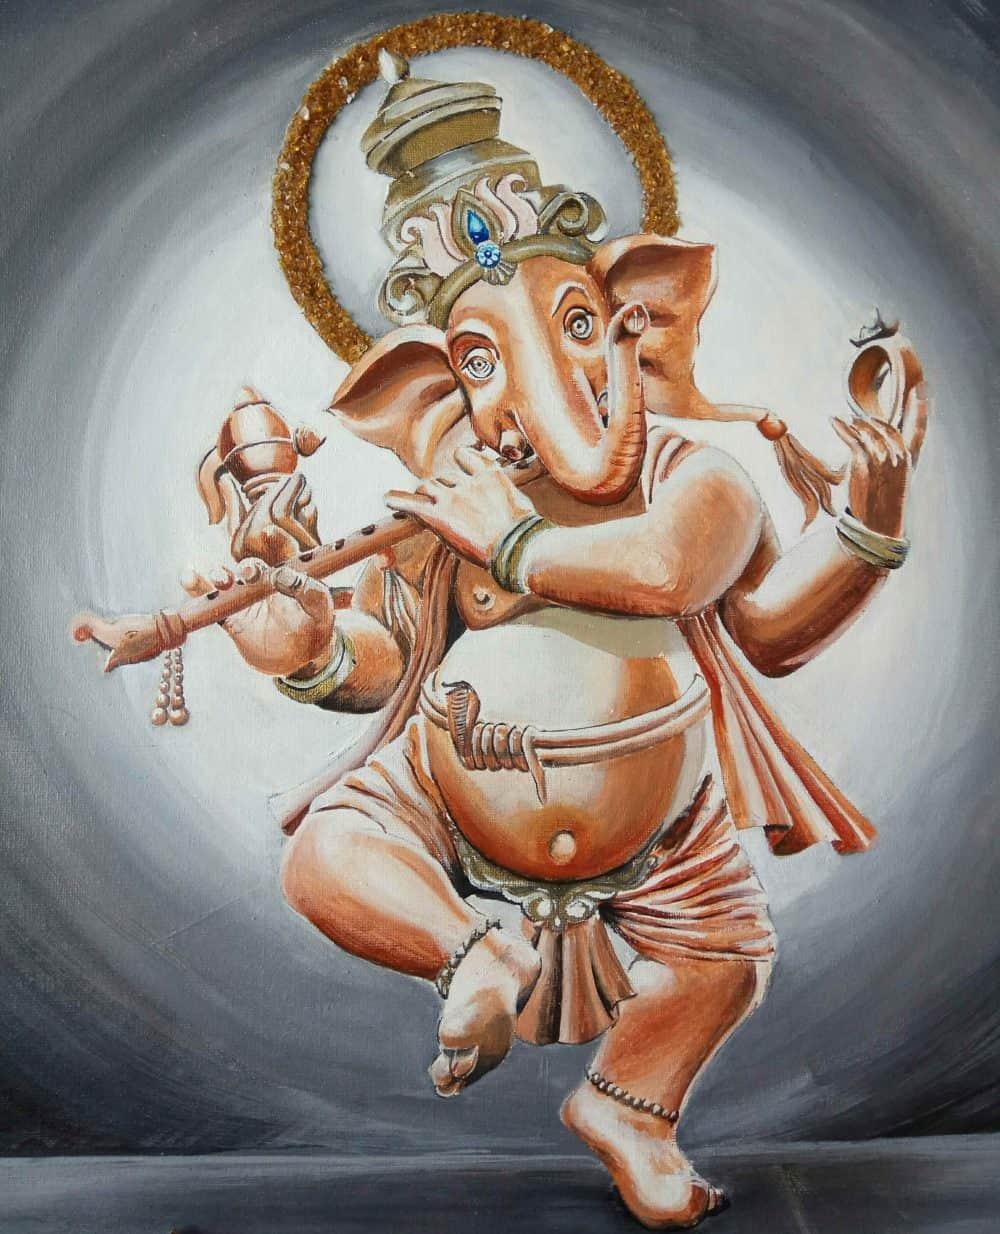 Mauritius Arts & Artists - mauritius-arts-avinash-dwarku-ganesha-3D